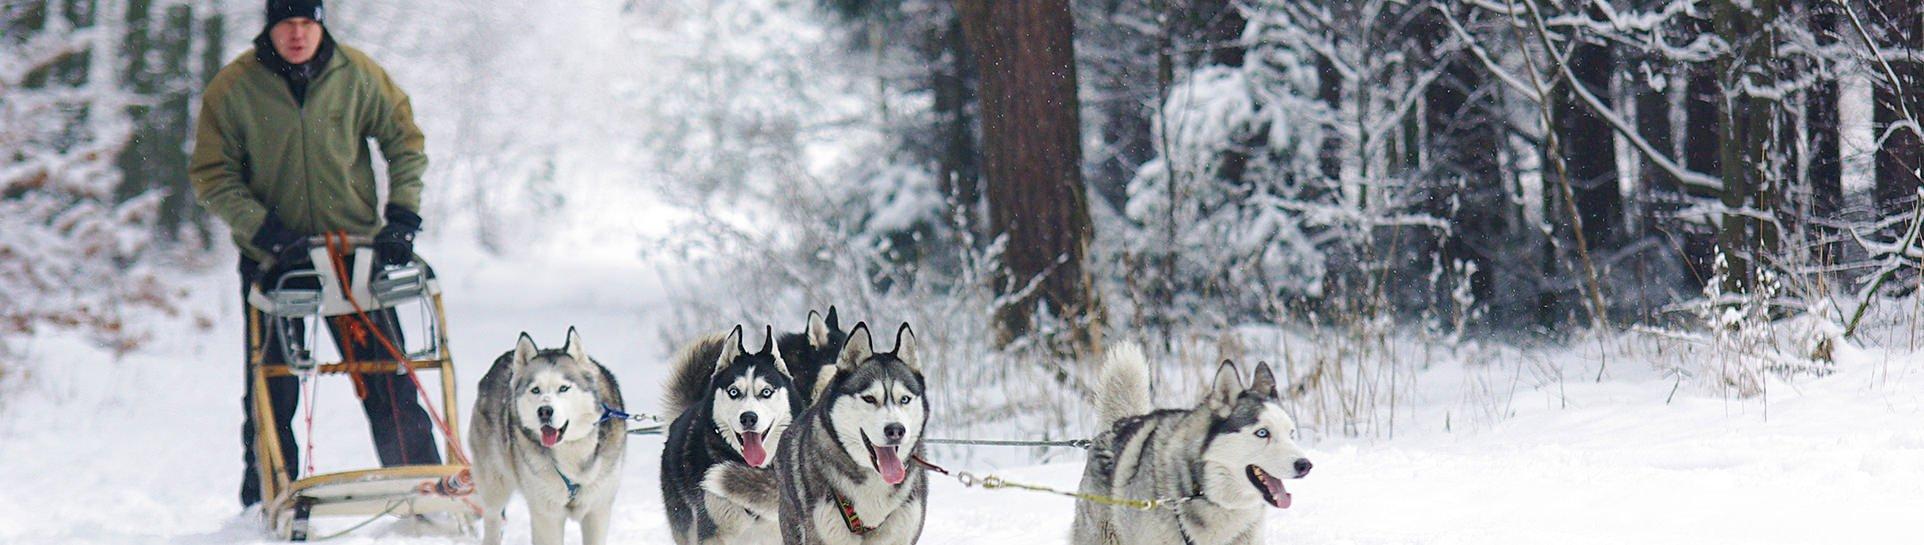 Winter Norway & Finland Tour